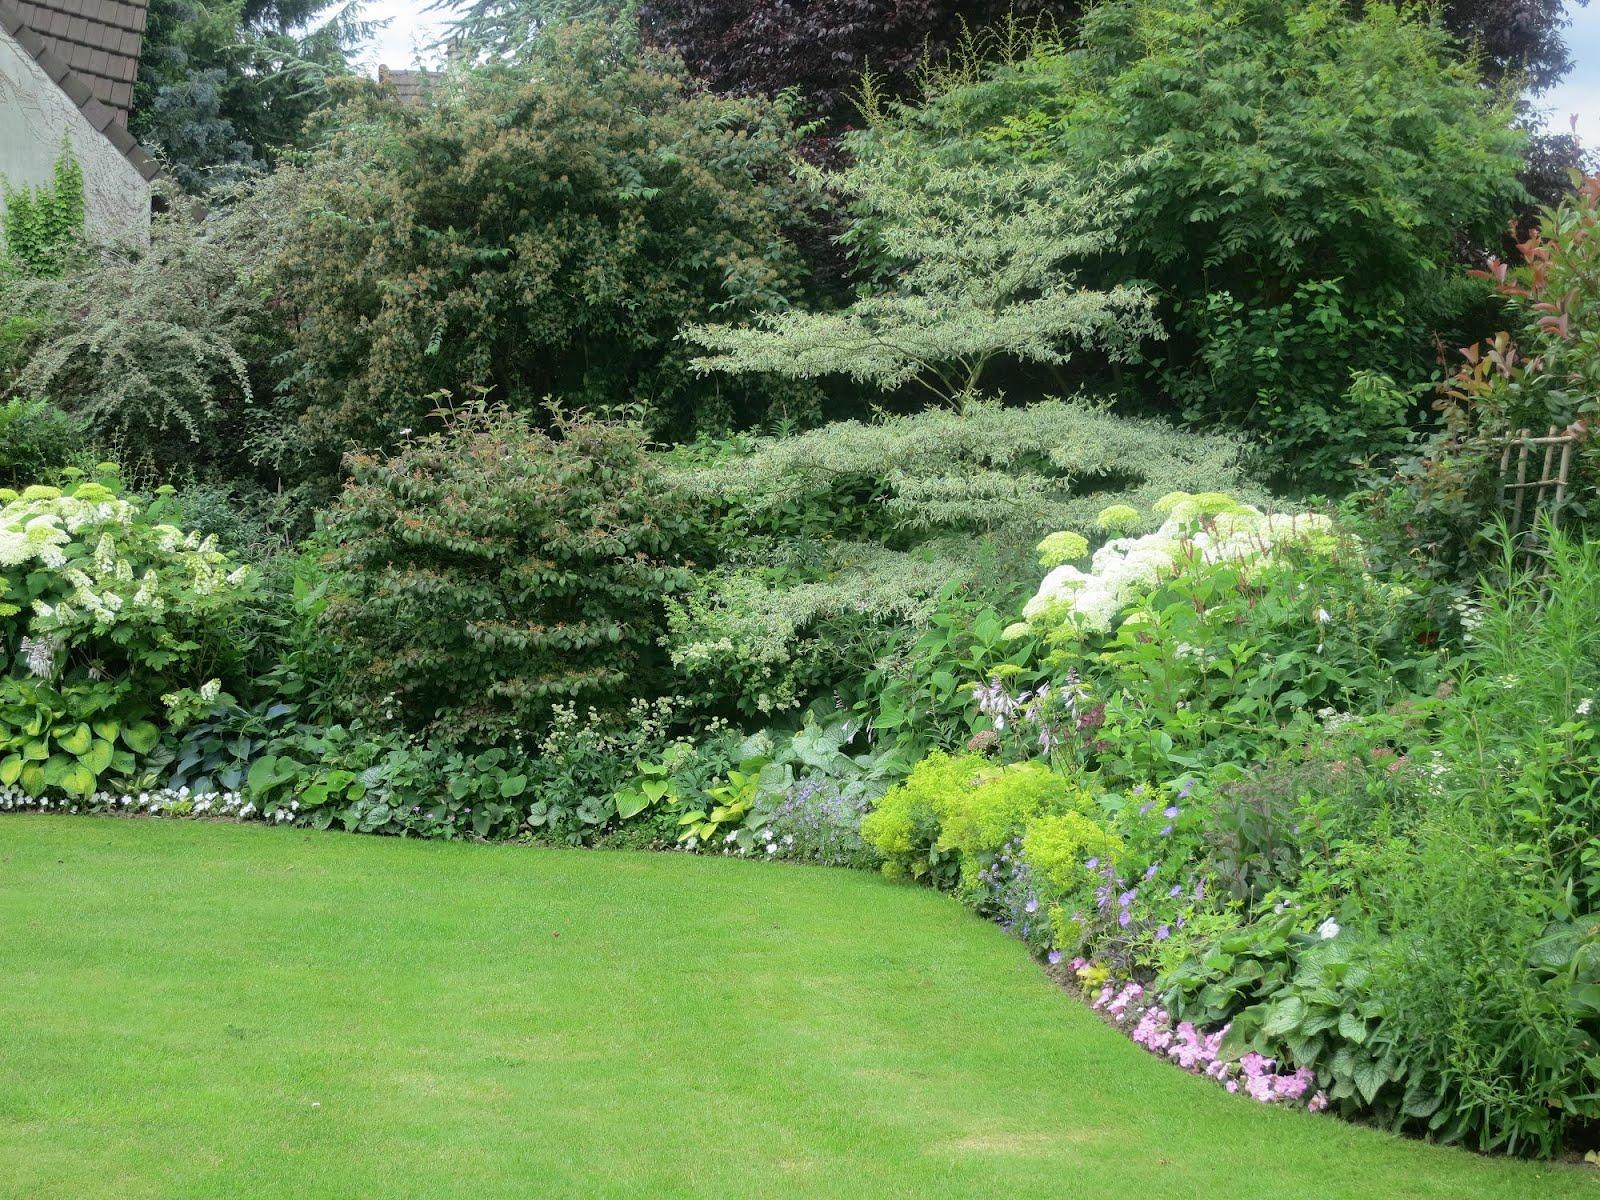 Nicolas paysagiste jardins for Jardin anglais vegetaux